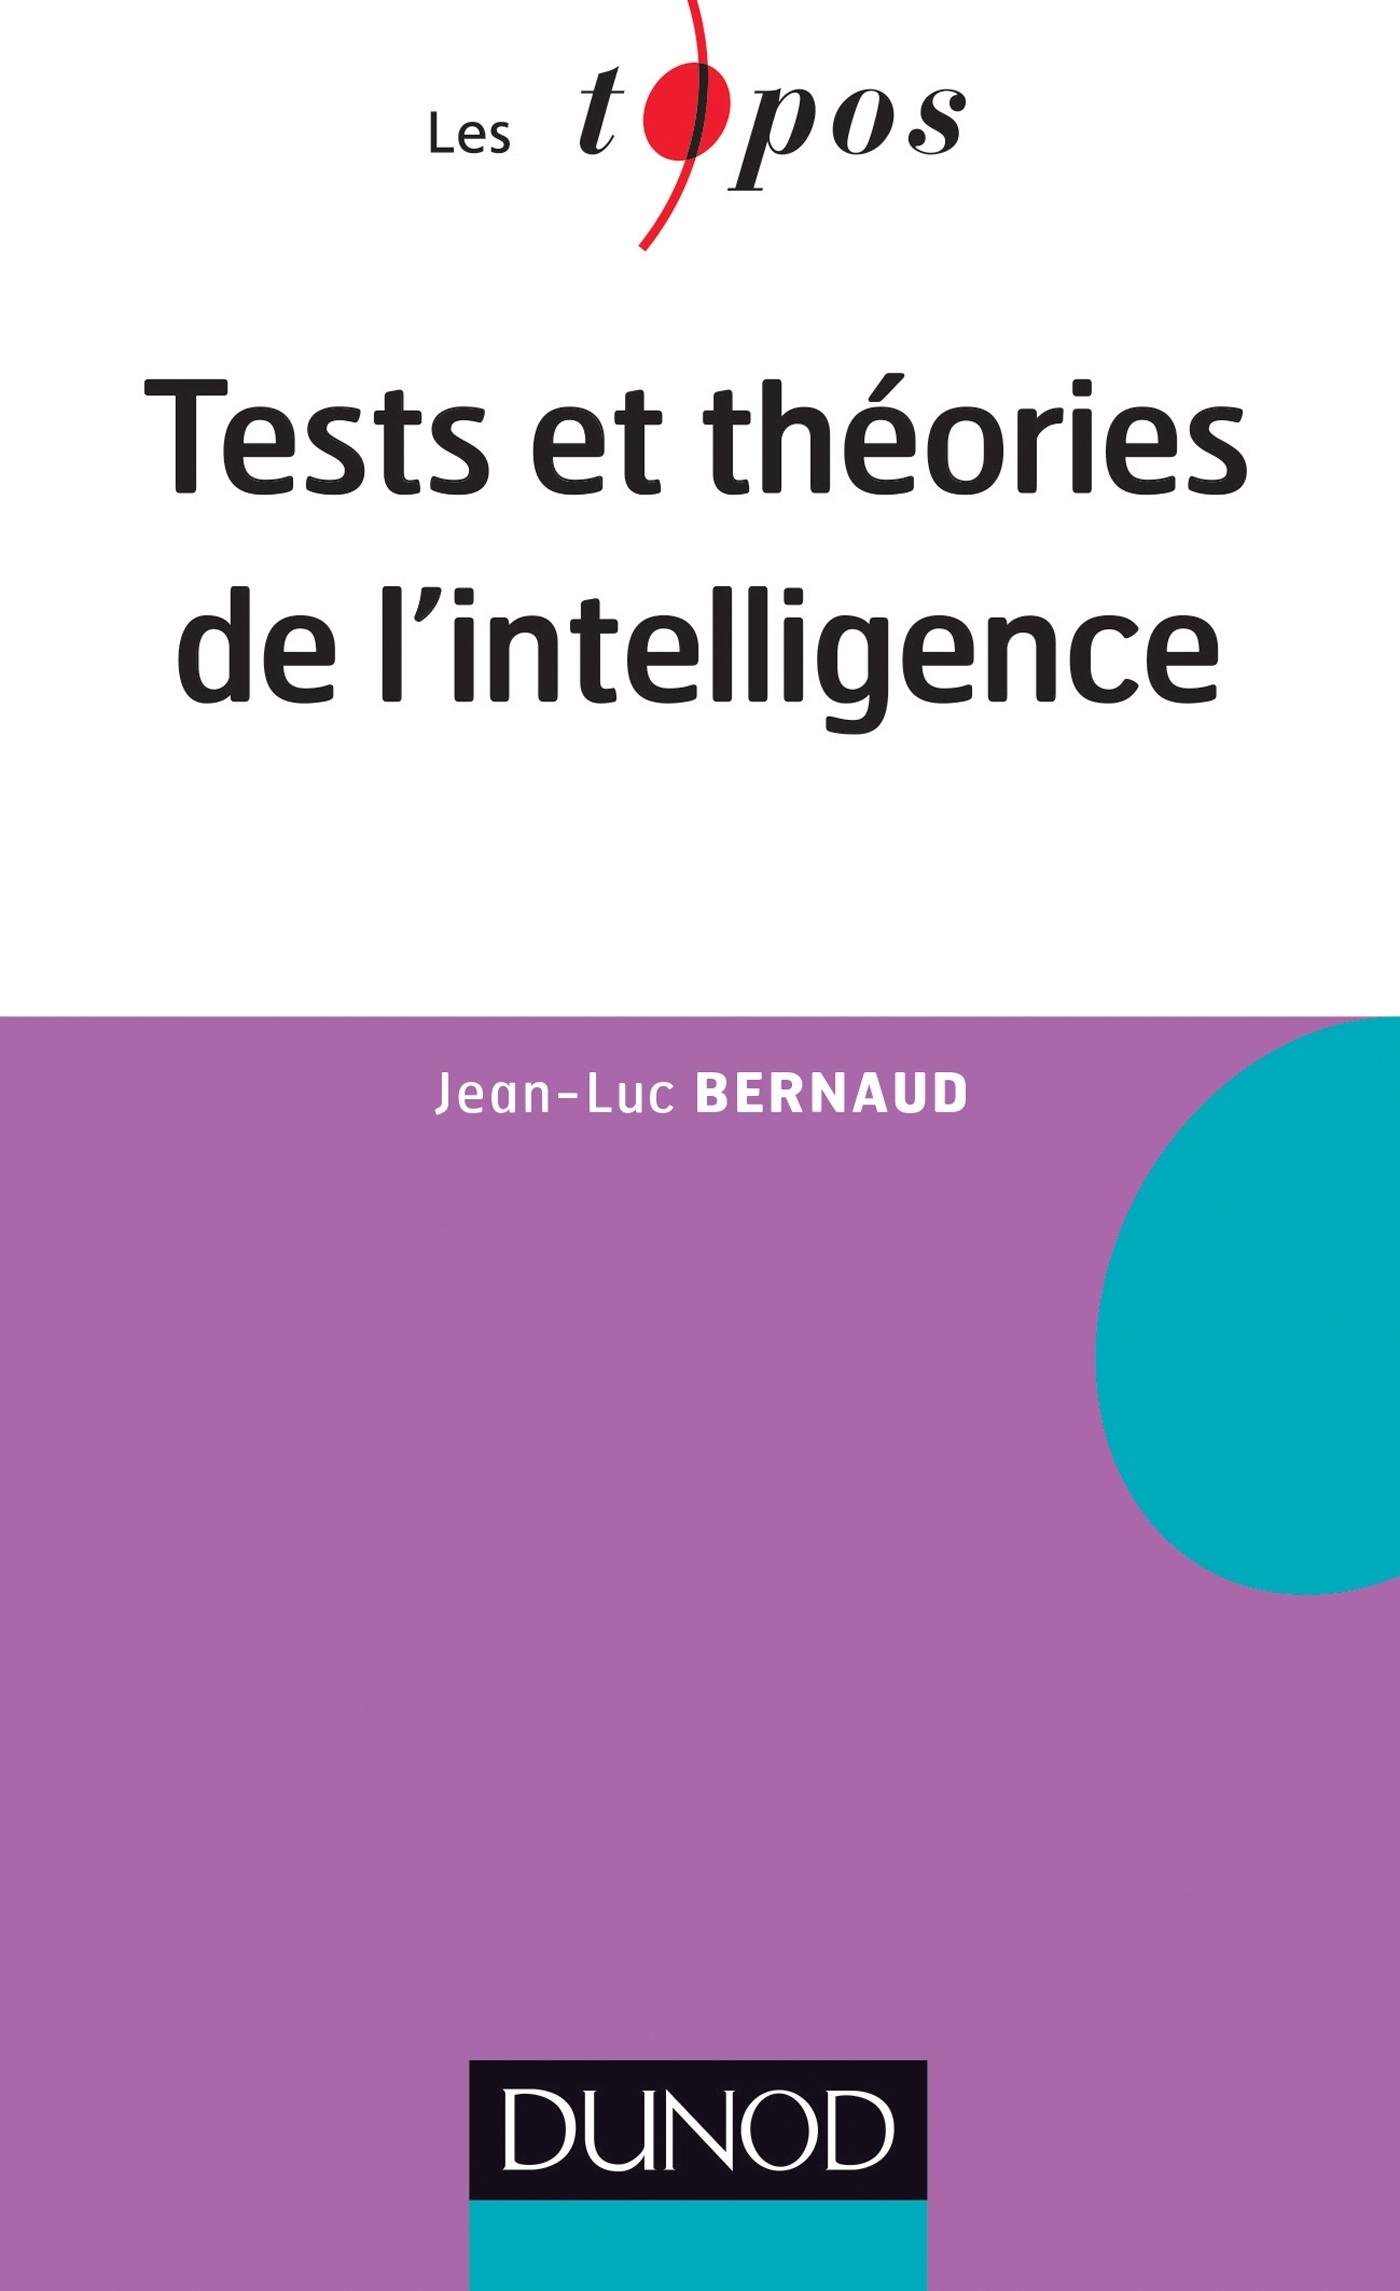 TESTS ET THEORIES DE L'INTELLIGENCE